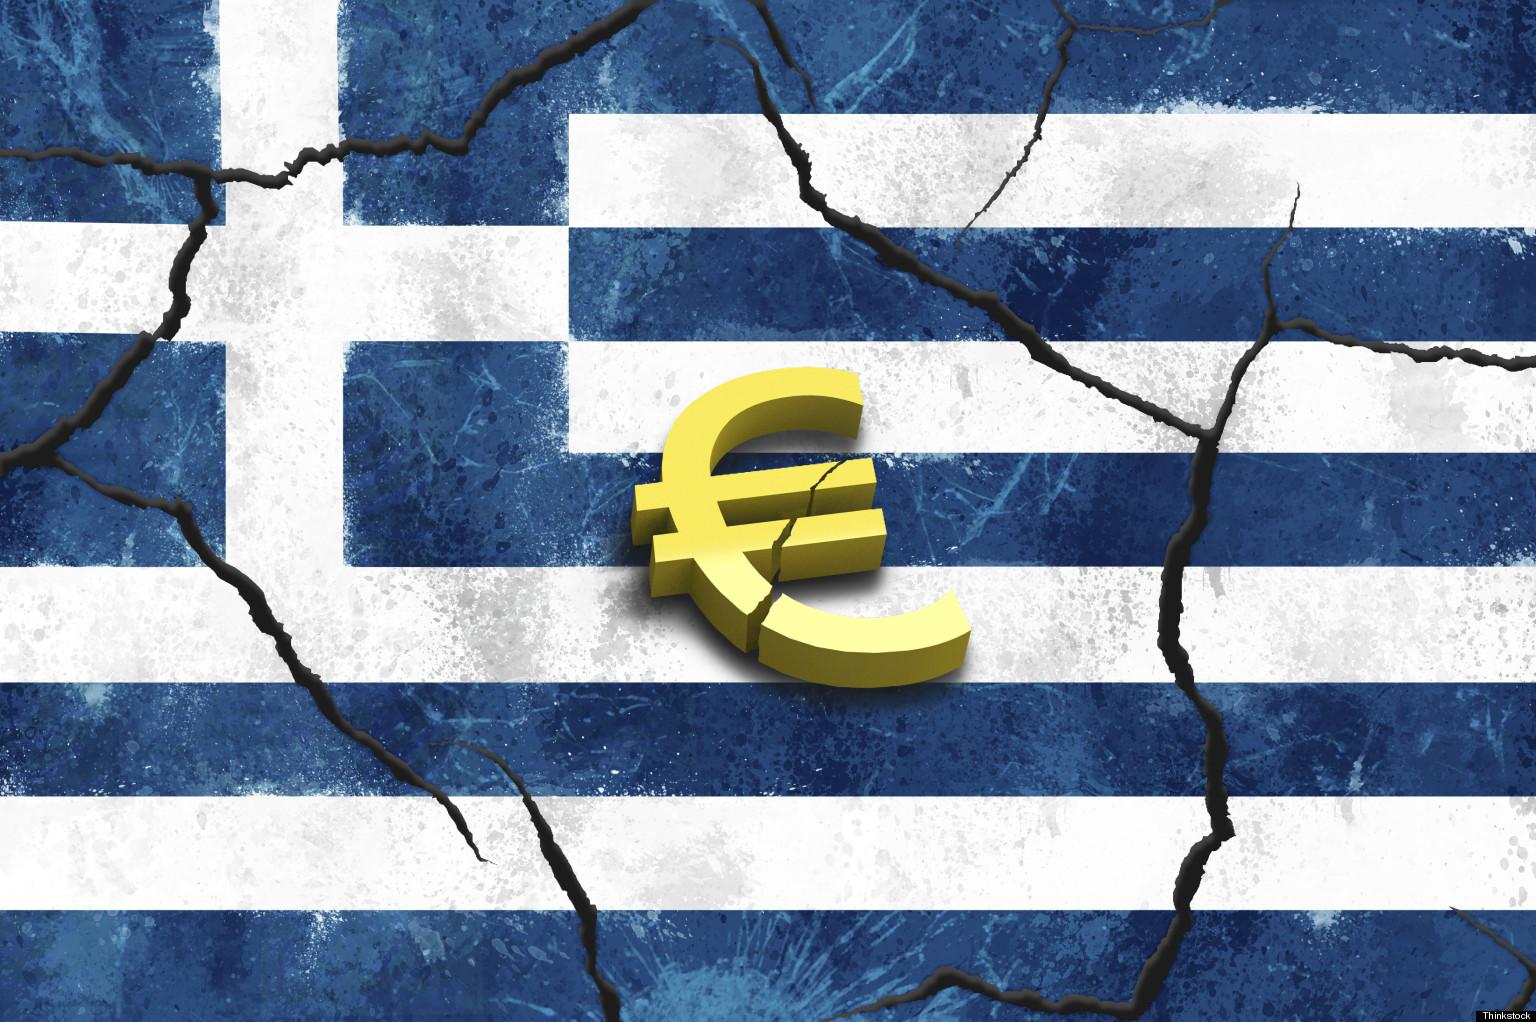 http://www.nextquotidiano.it/wp-content/uploads/2014/12/grecia-euro.jpg